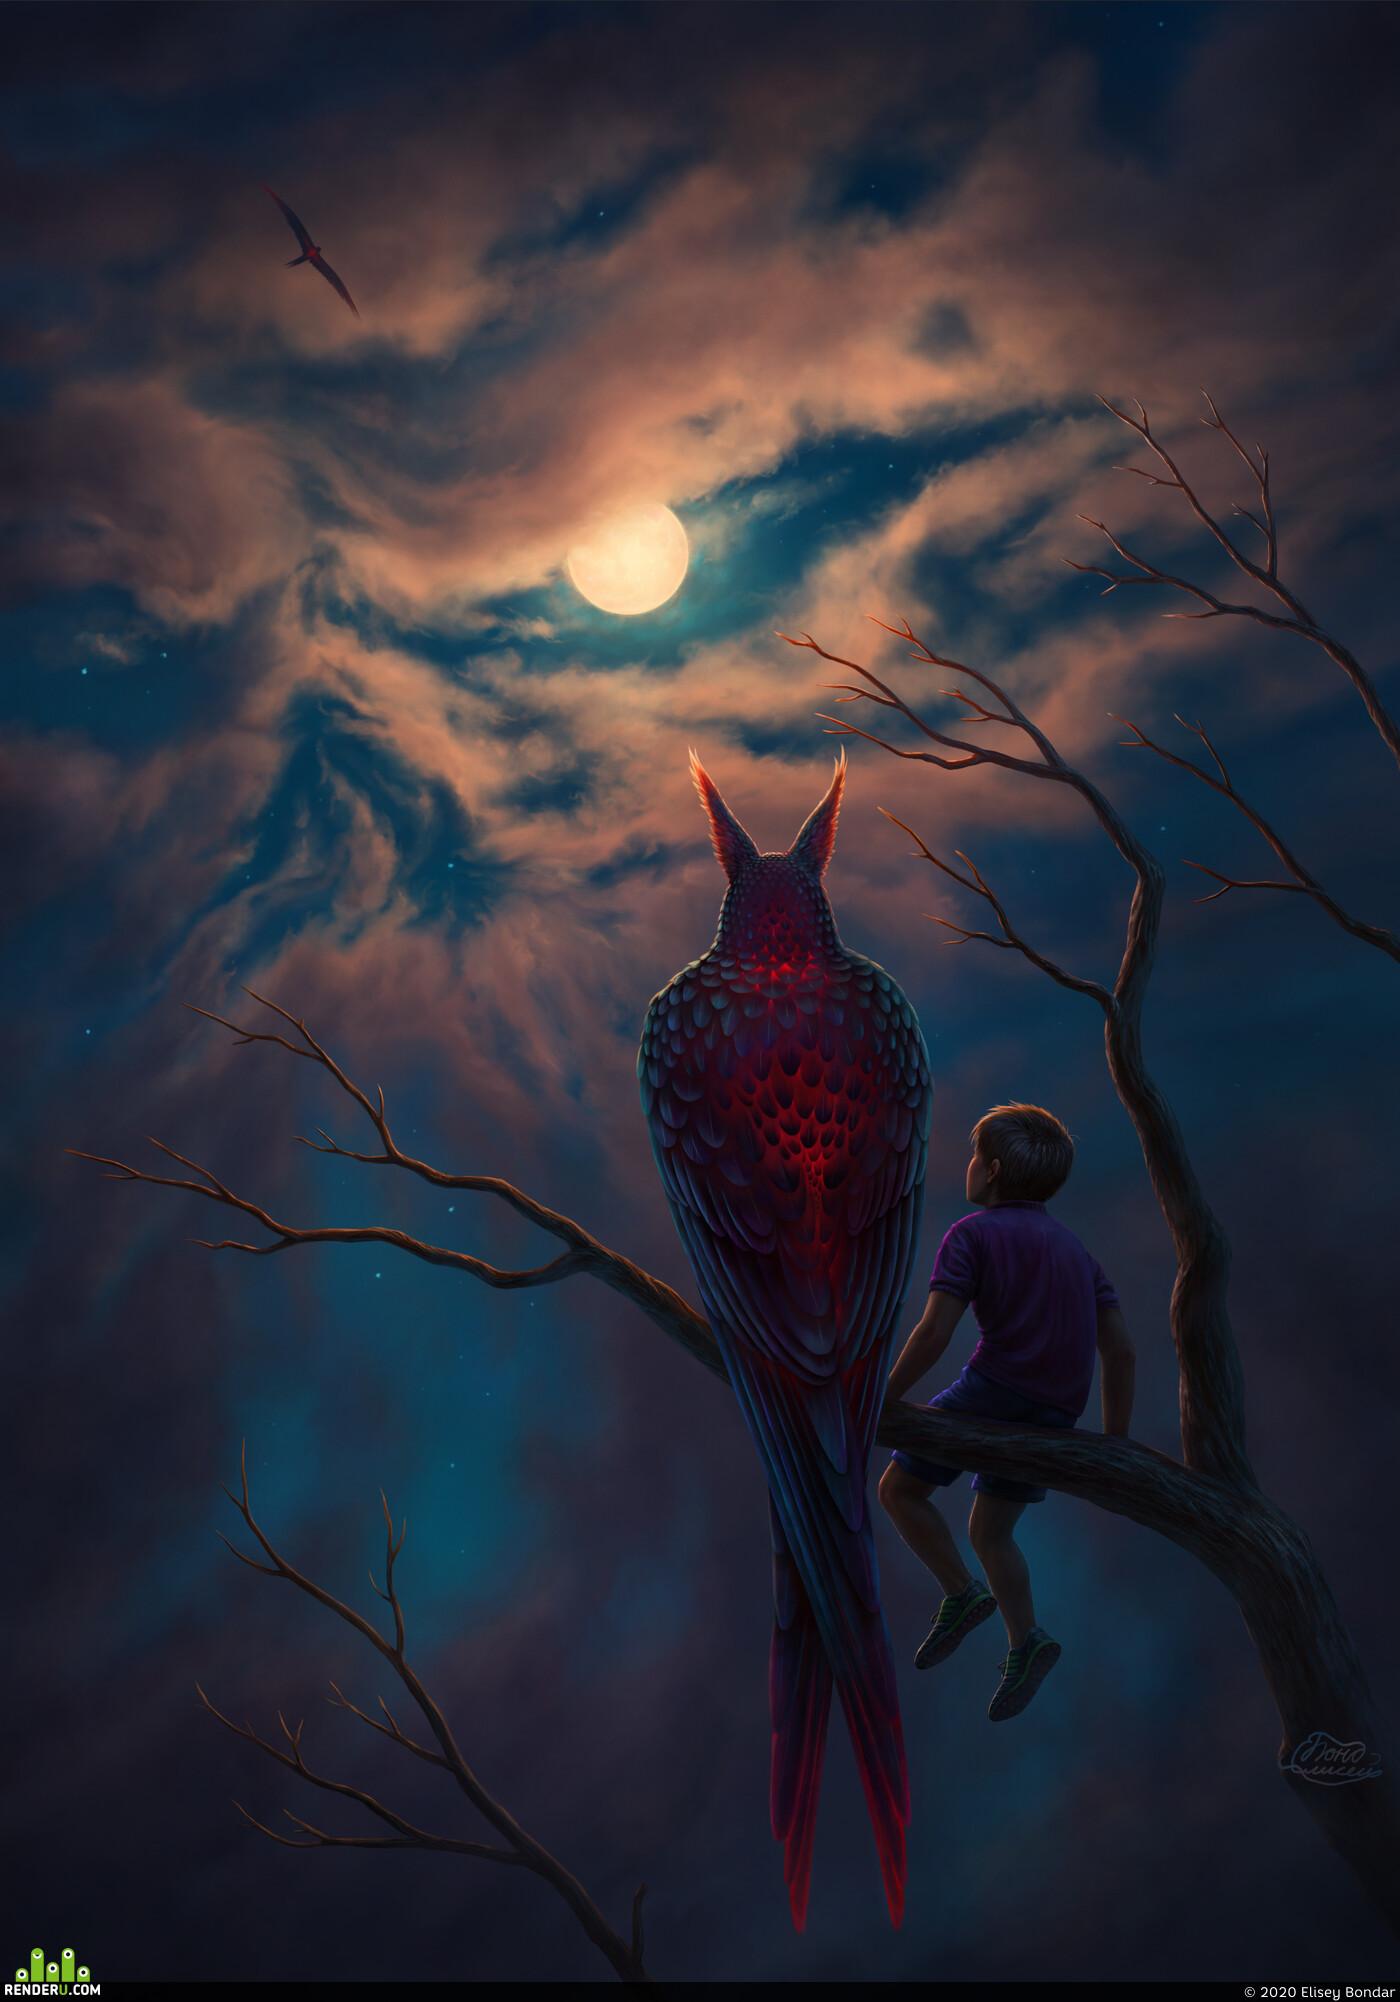 небо, ночь, луна, ребёнок, череп, облака